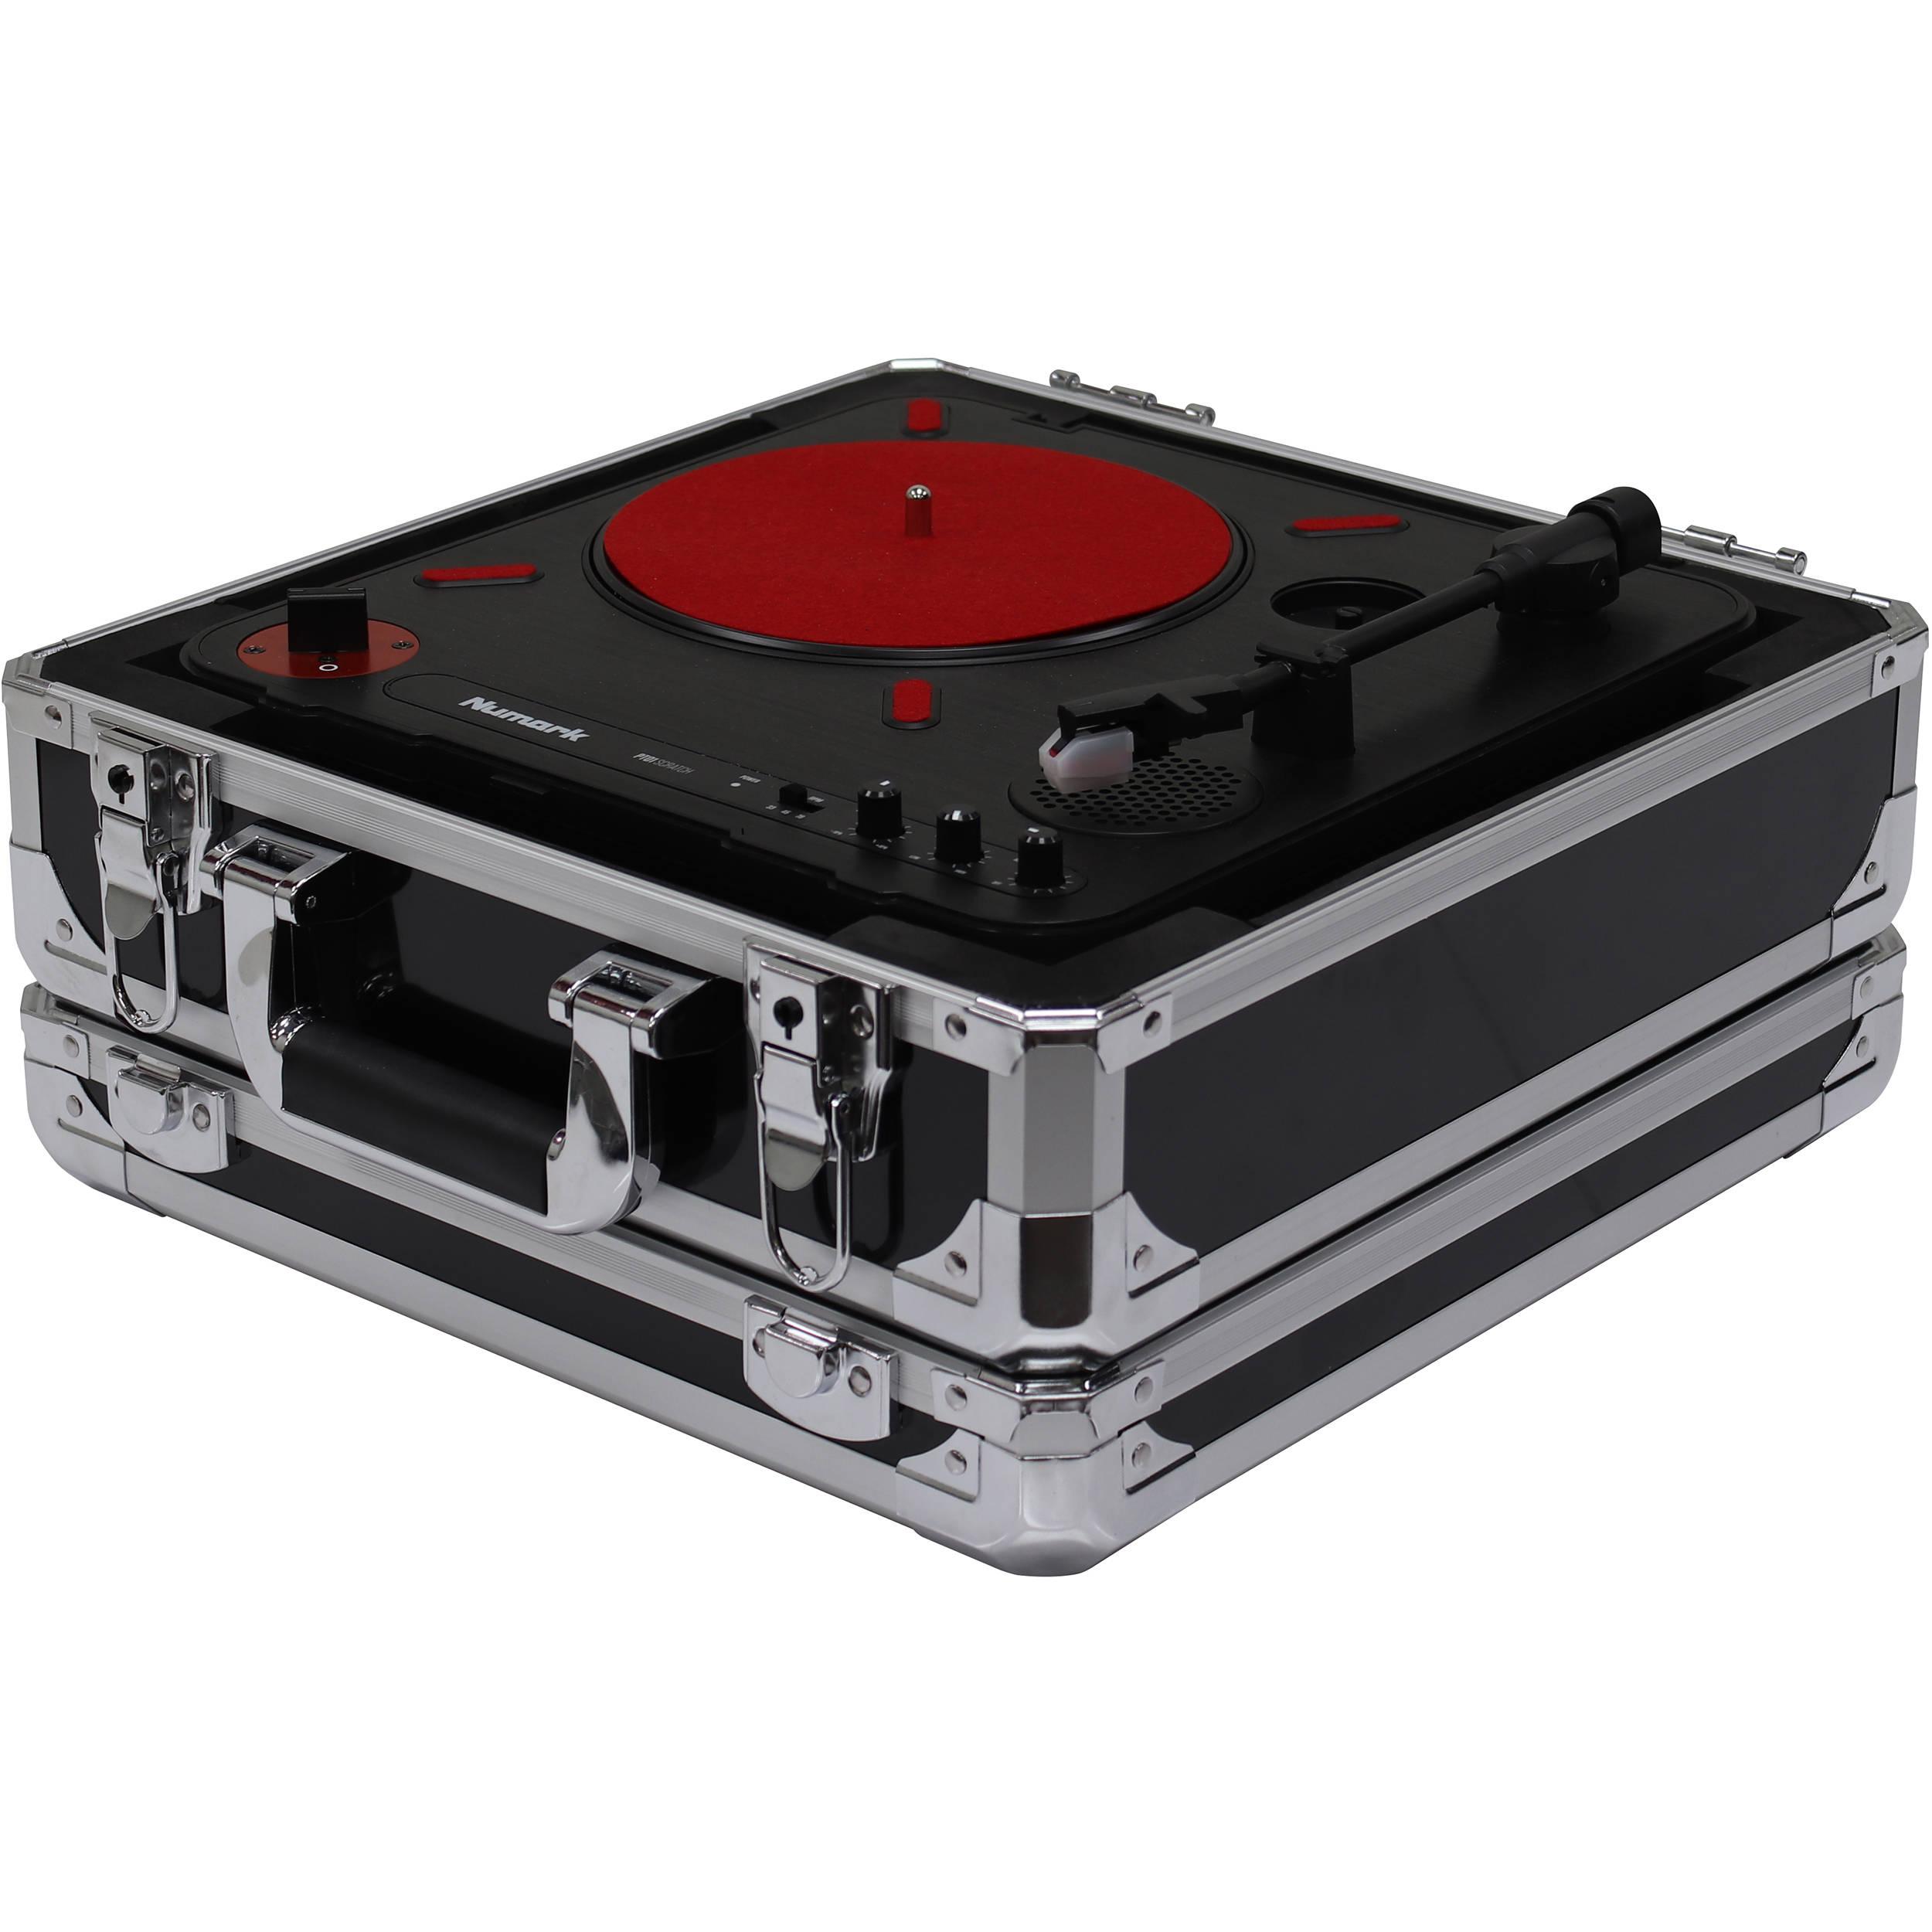 Odyssey Innovative Designs Krom Series Numark PT01 Scratch Portable  Turntable Case (Black)